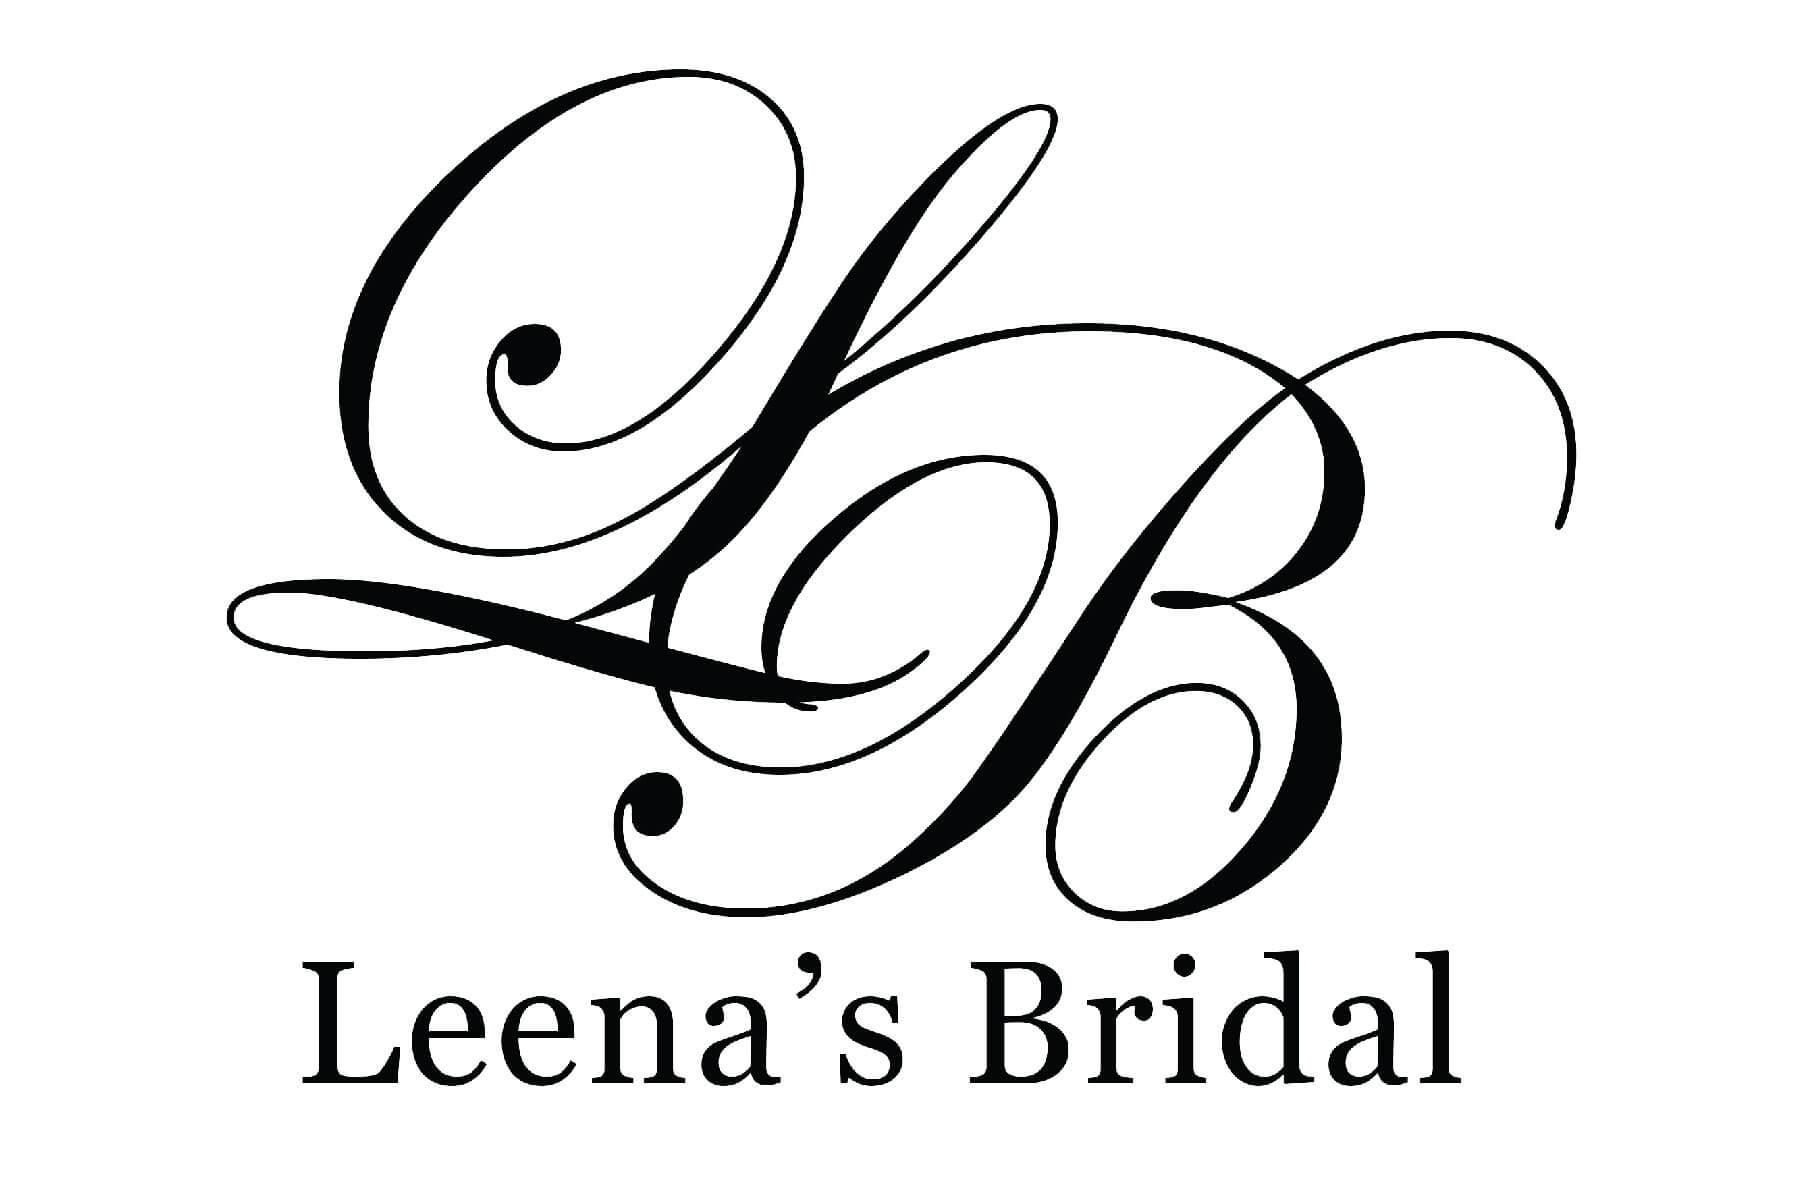 Leena's Bridal Boutique